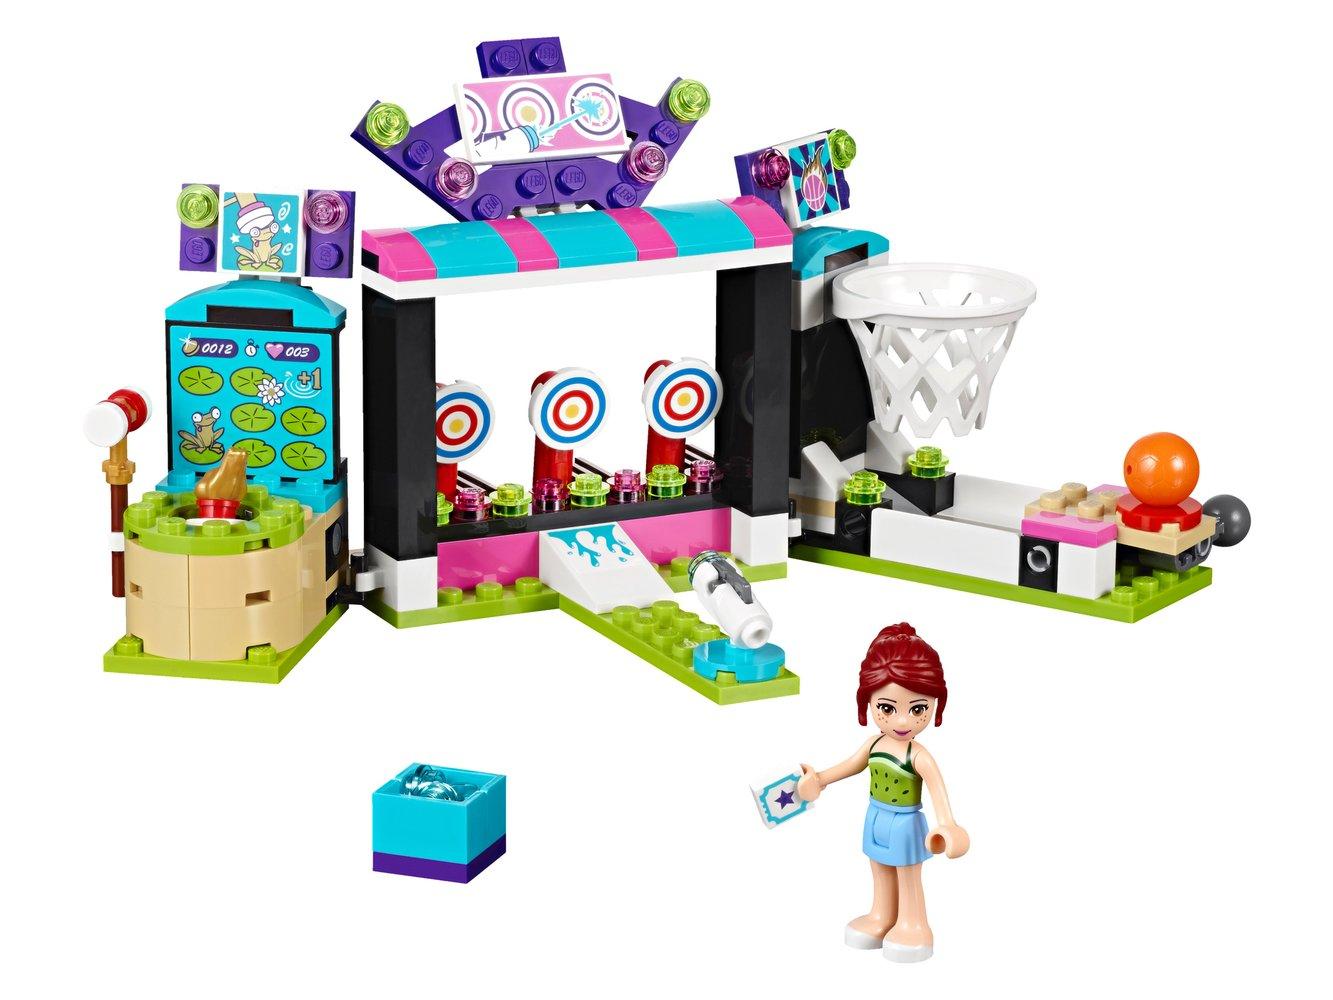 Amusement Park Arcade